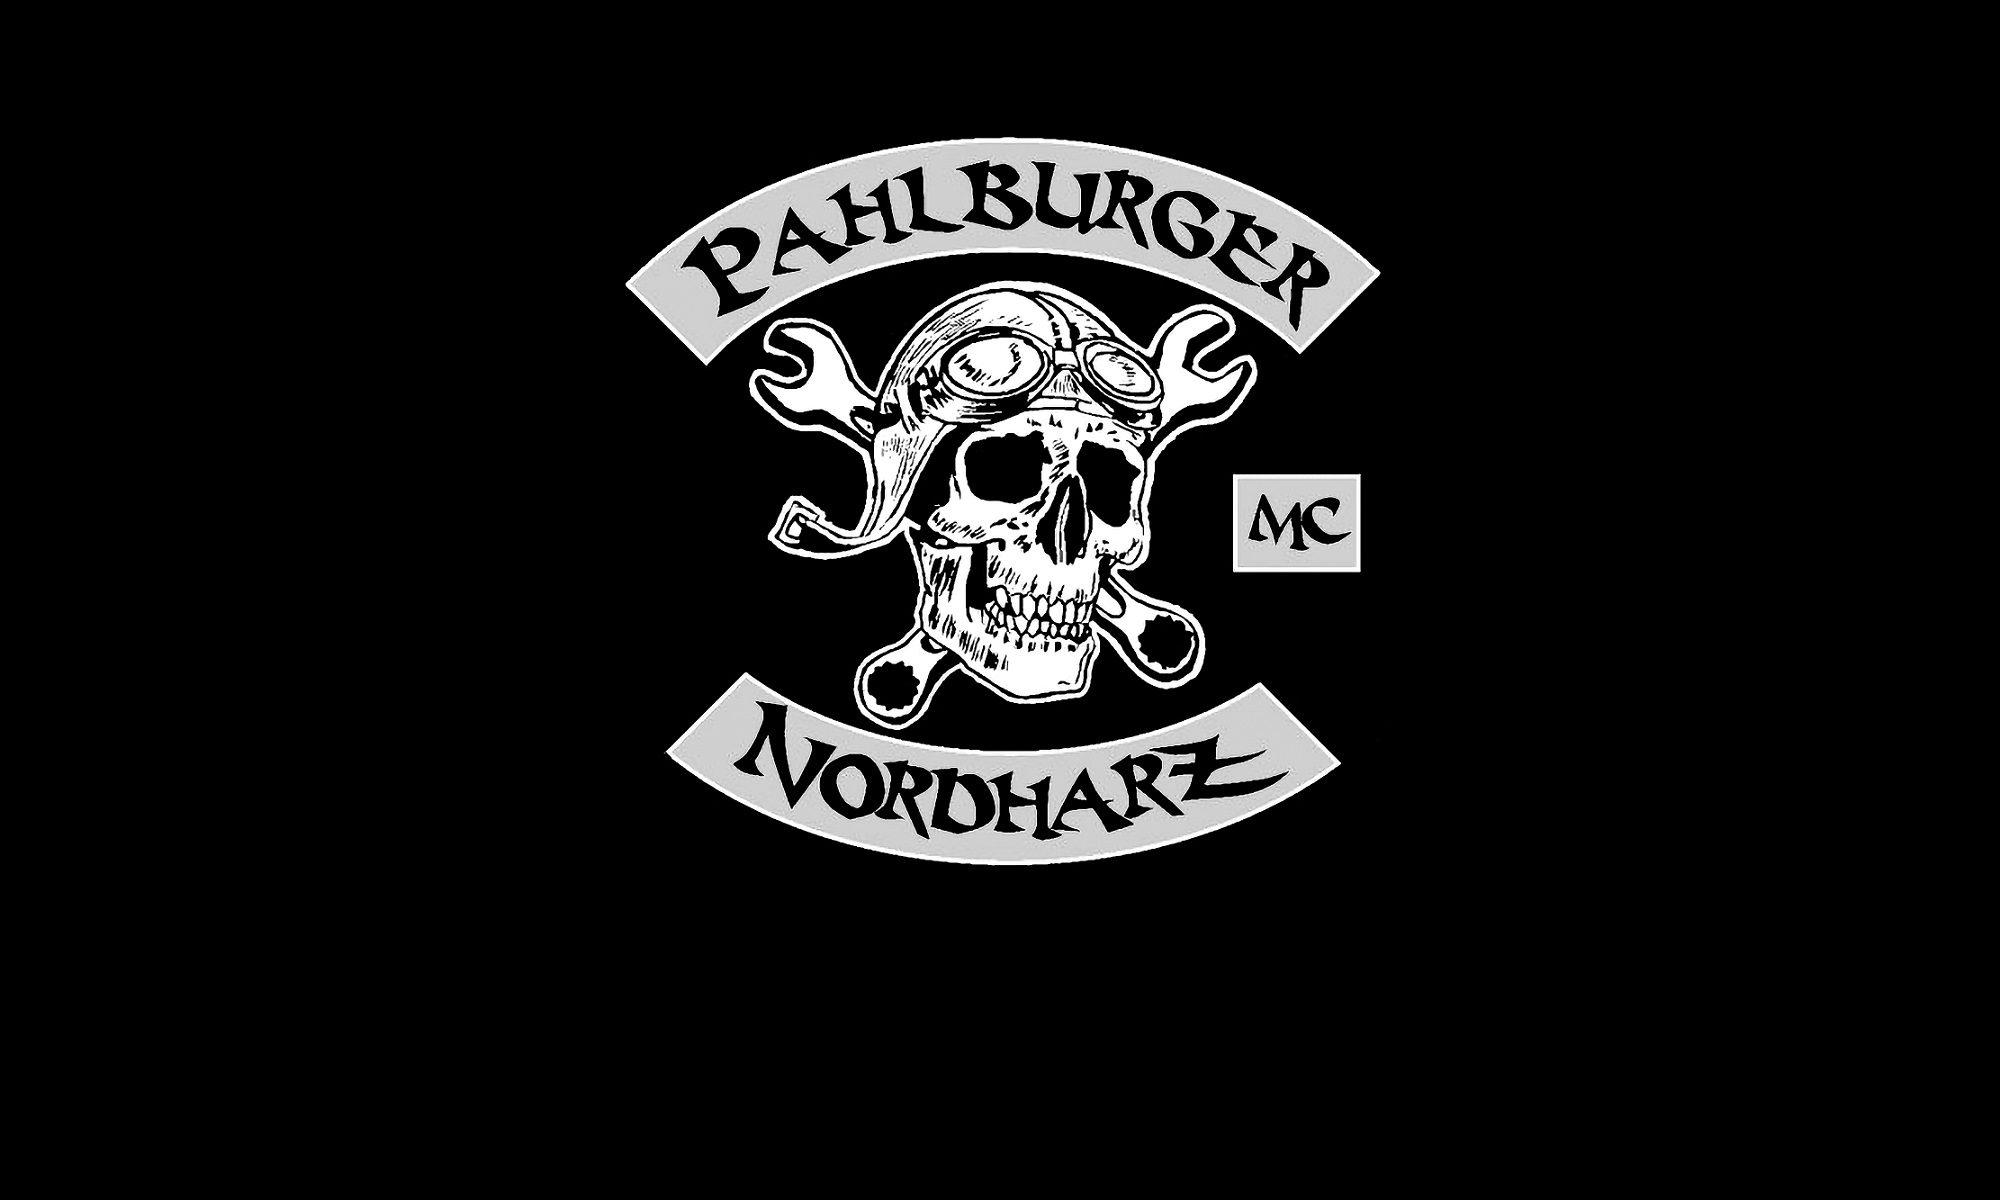 Pahlburger MC Nordharz